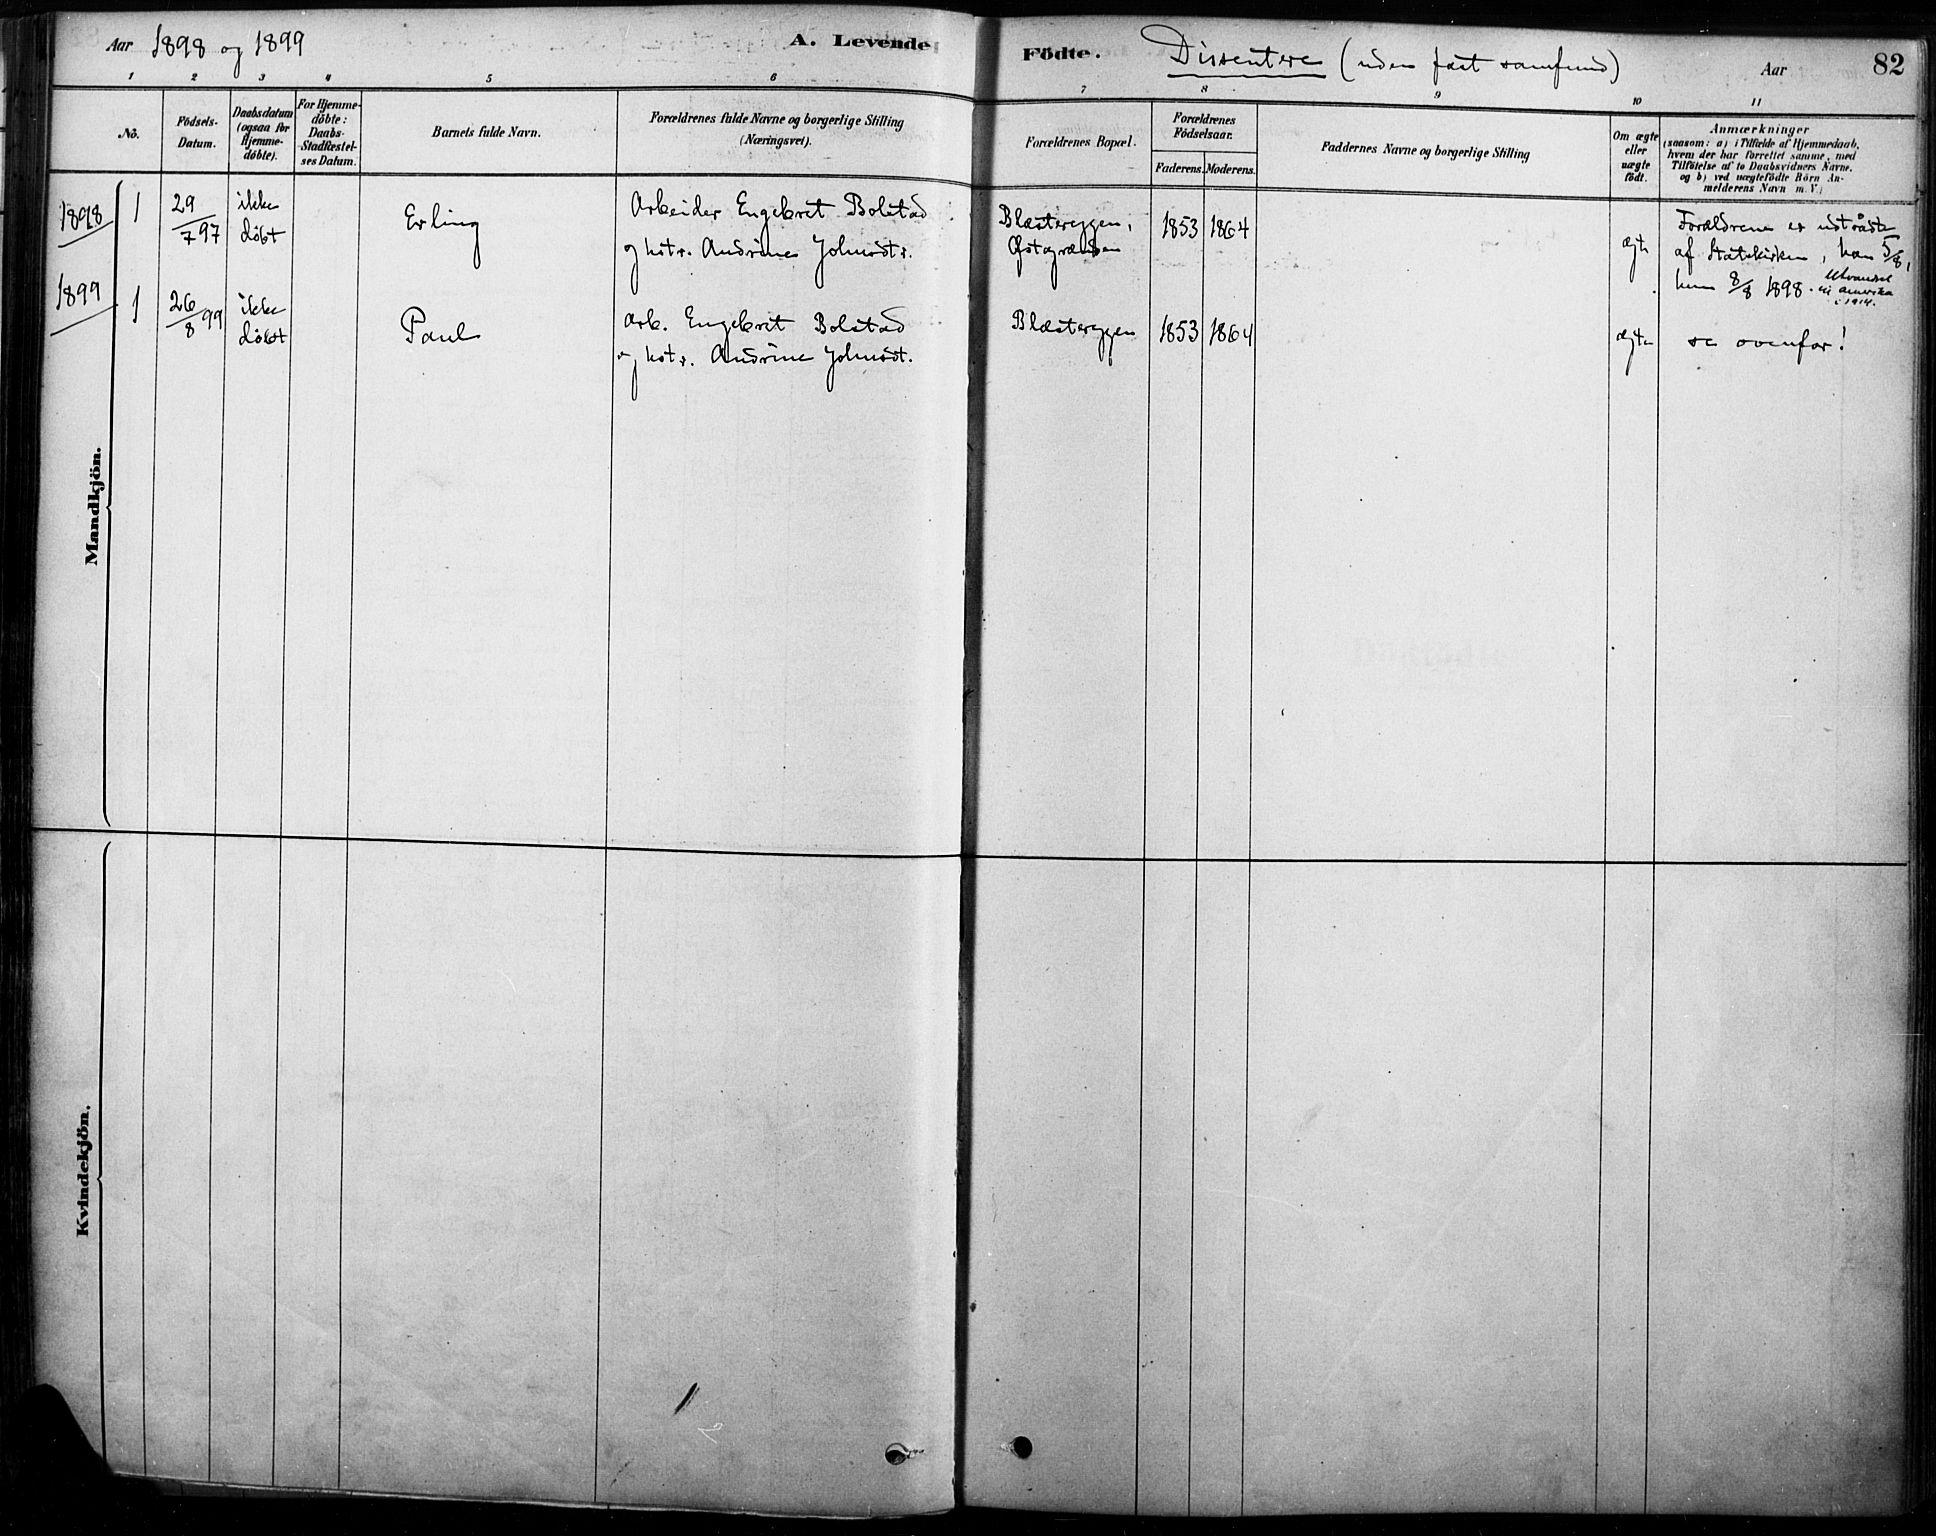 SAH, Rendalen prestekontor, H/Ha/Haa/L0009: Ministerialbok nr. 9, 1878-1901, s. 82